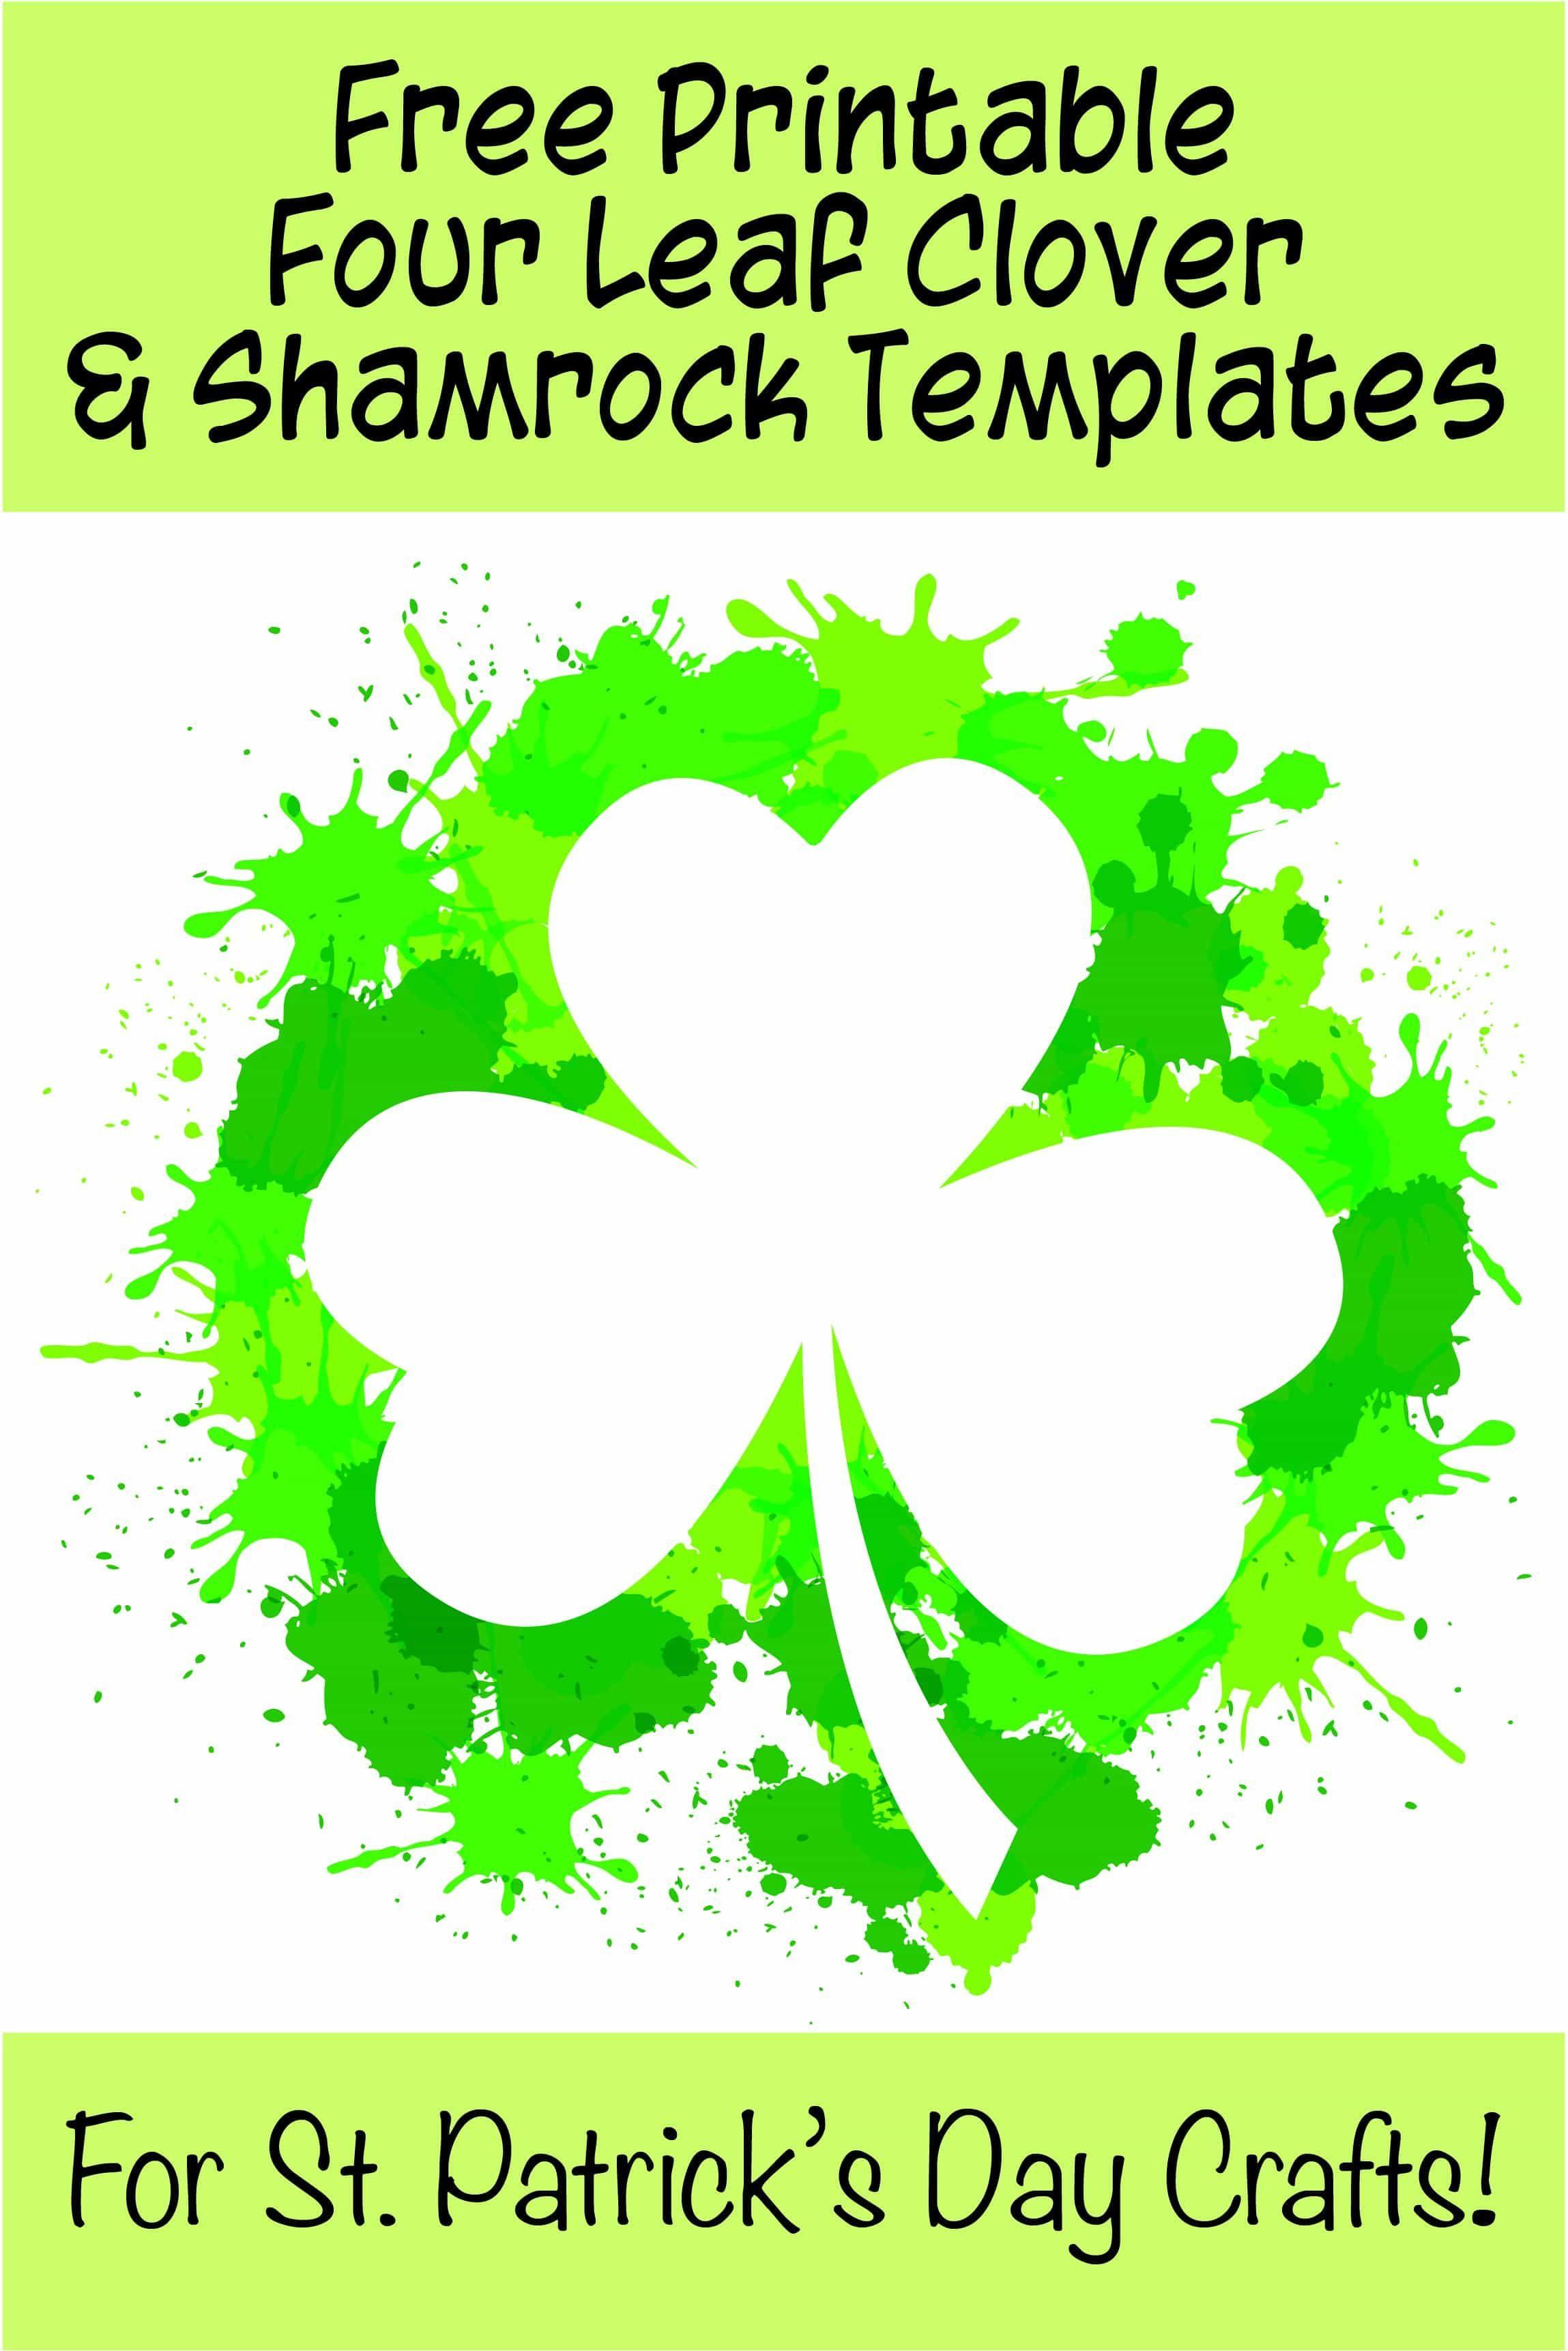 Free Printable Green Shamrock Template